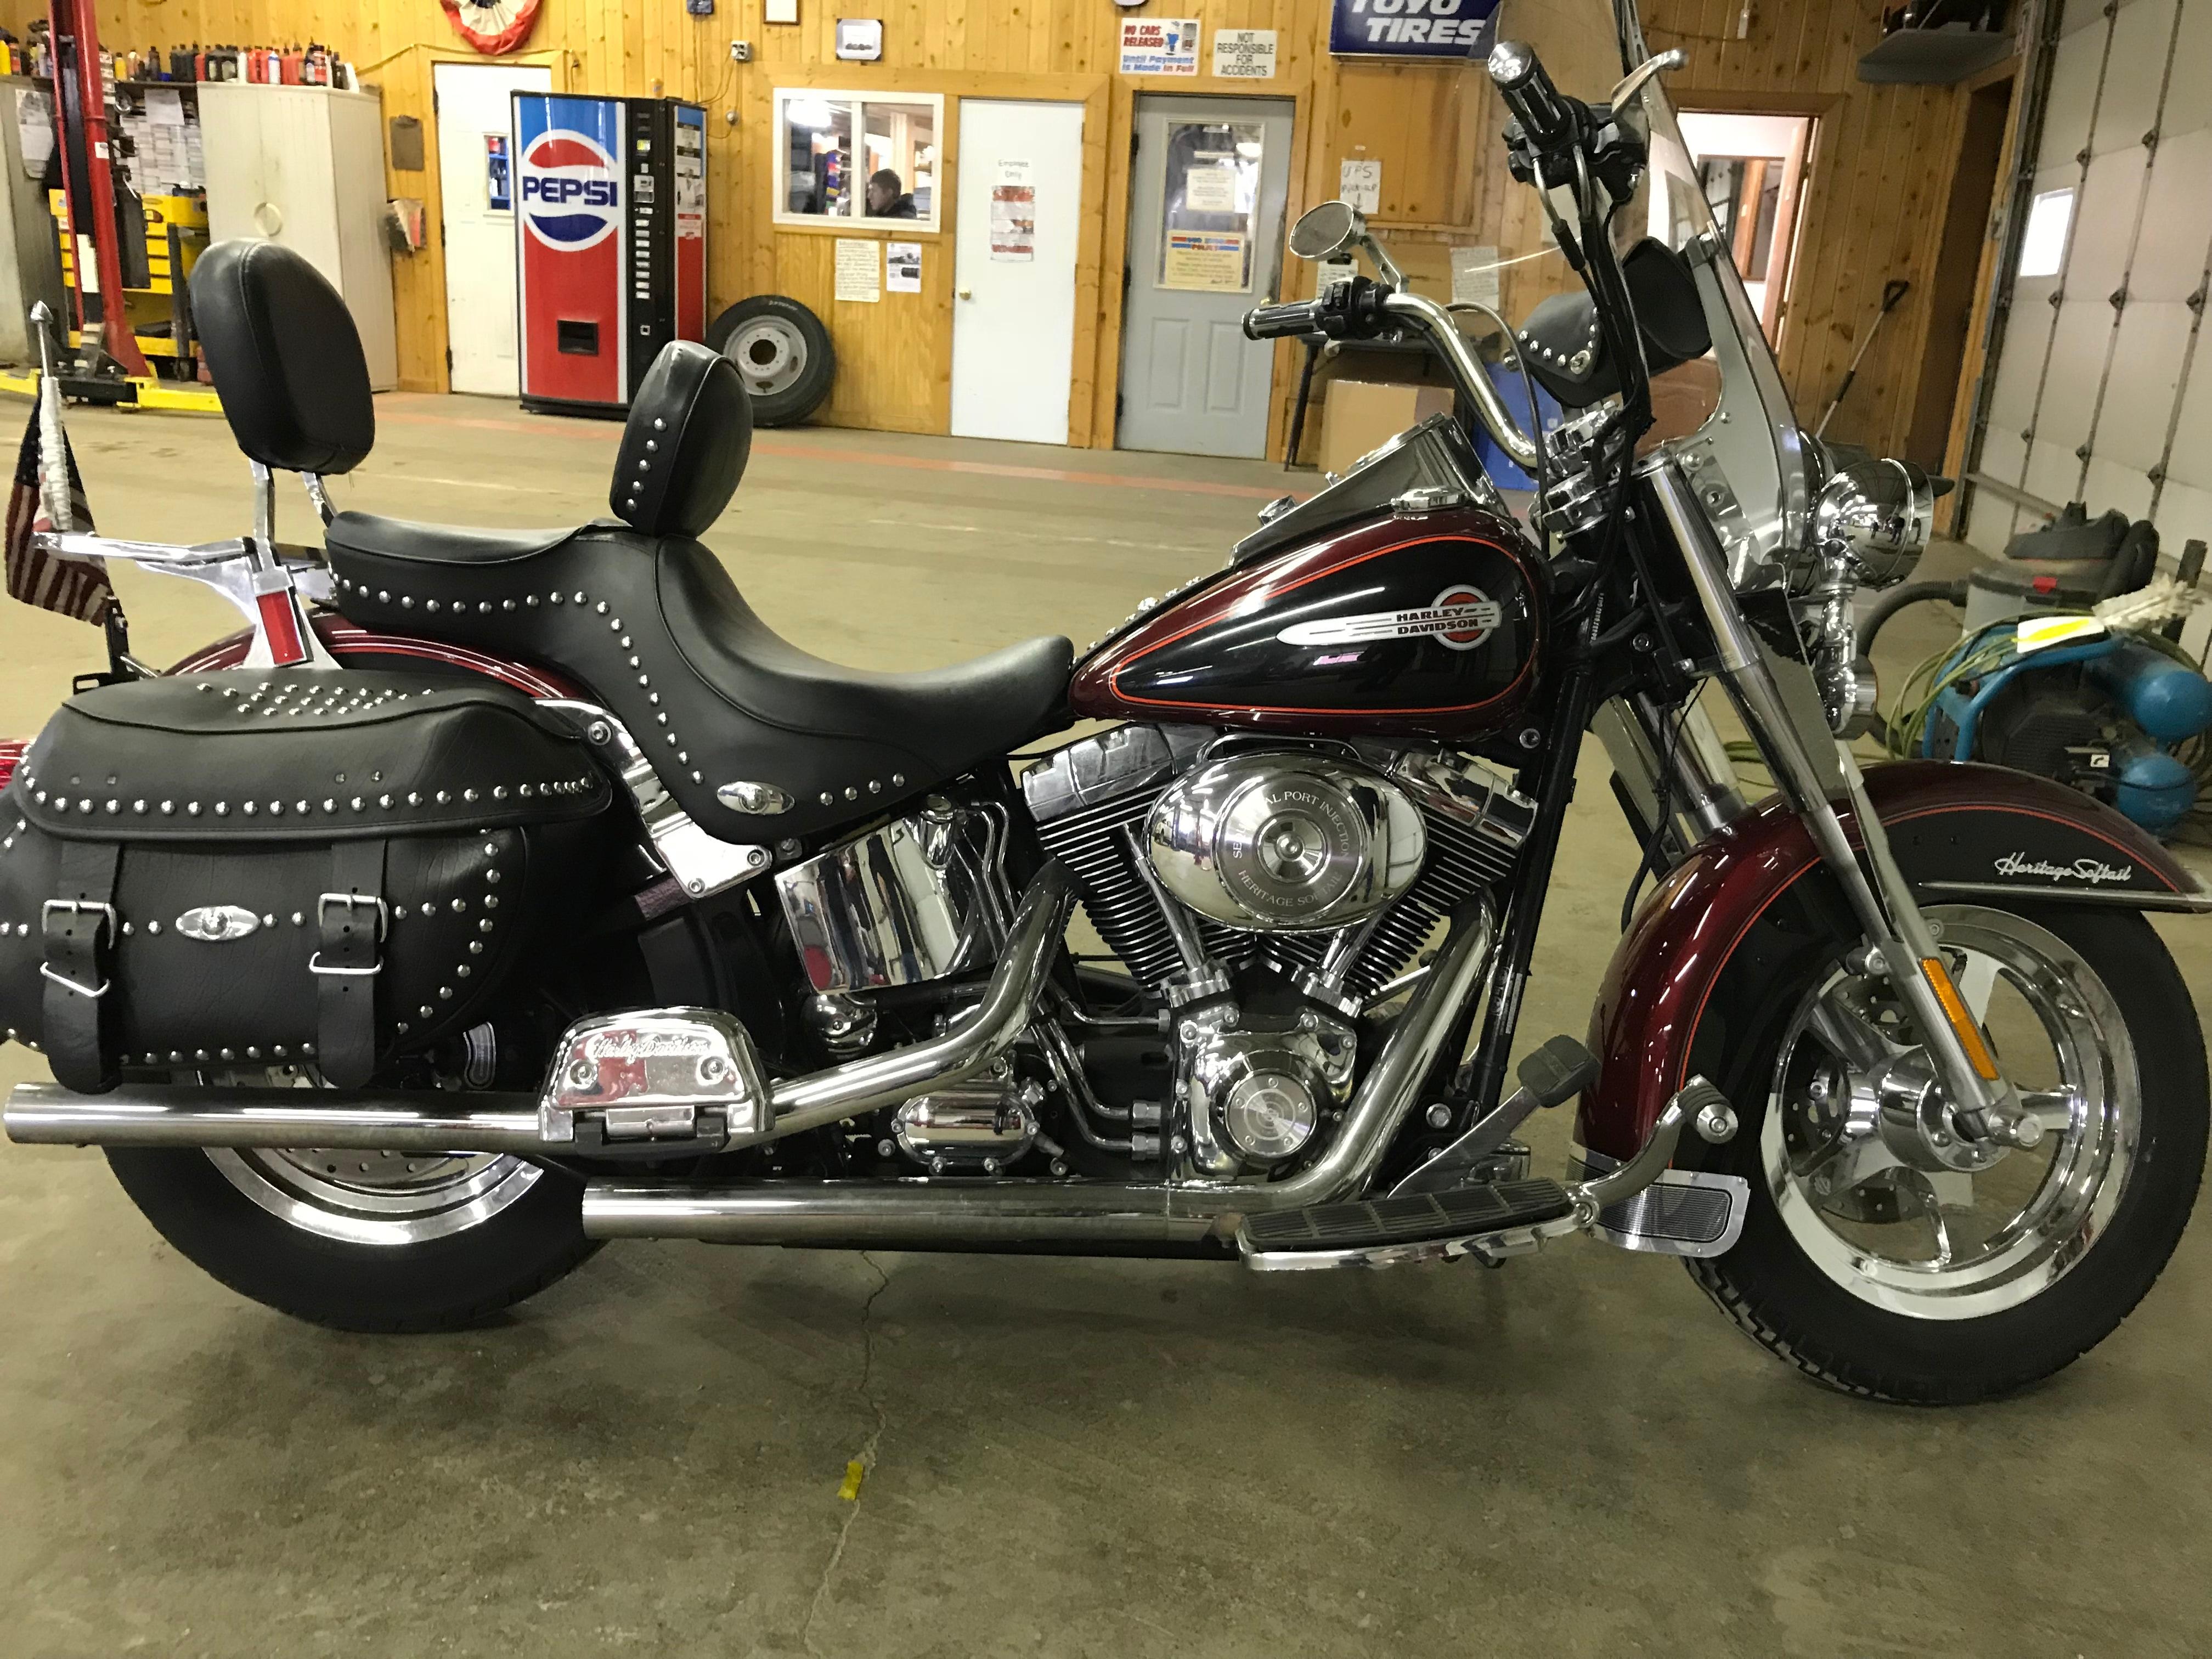 2002 Harley-Dav Flstci HEAVY